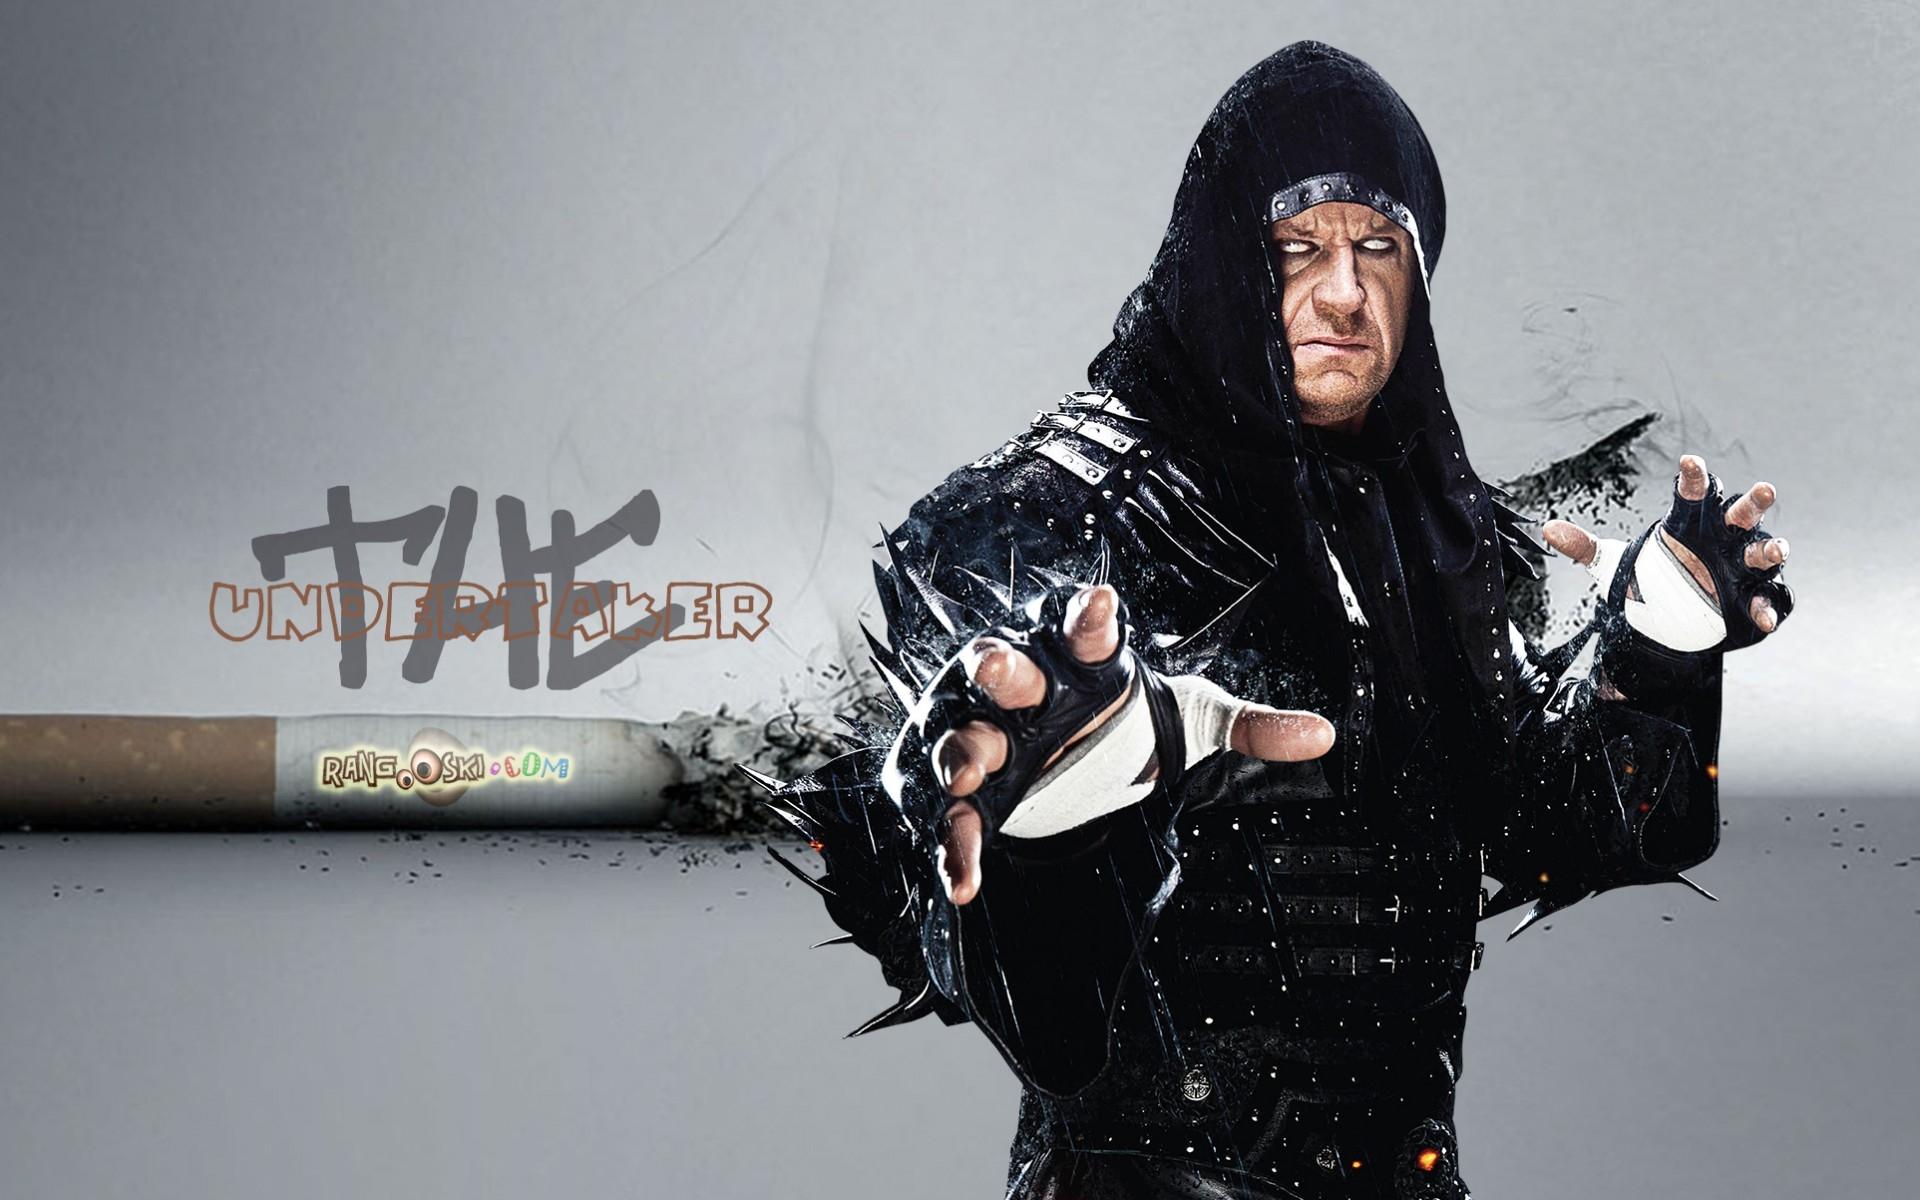 Undertaker Wallpapers Free Download